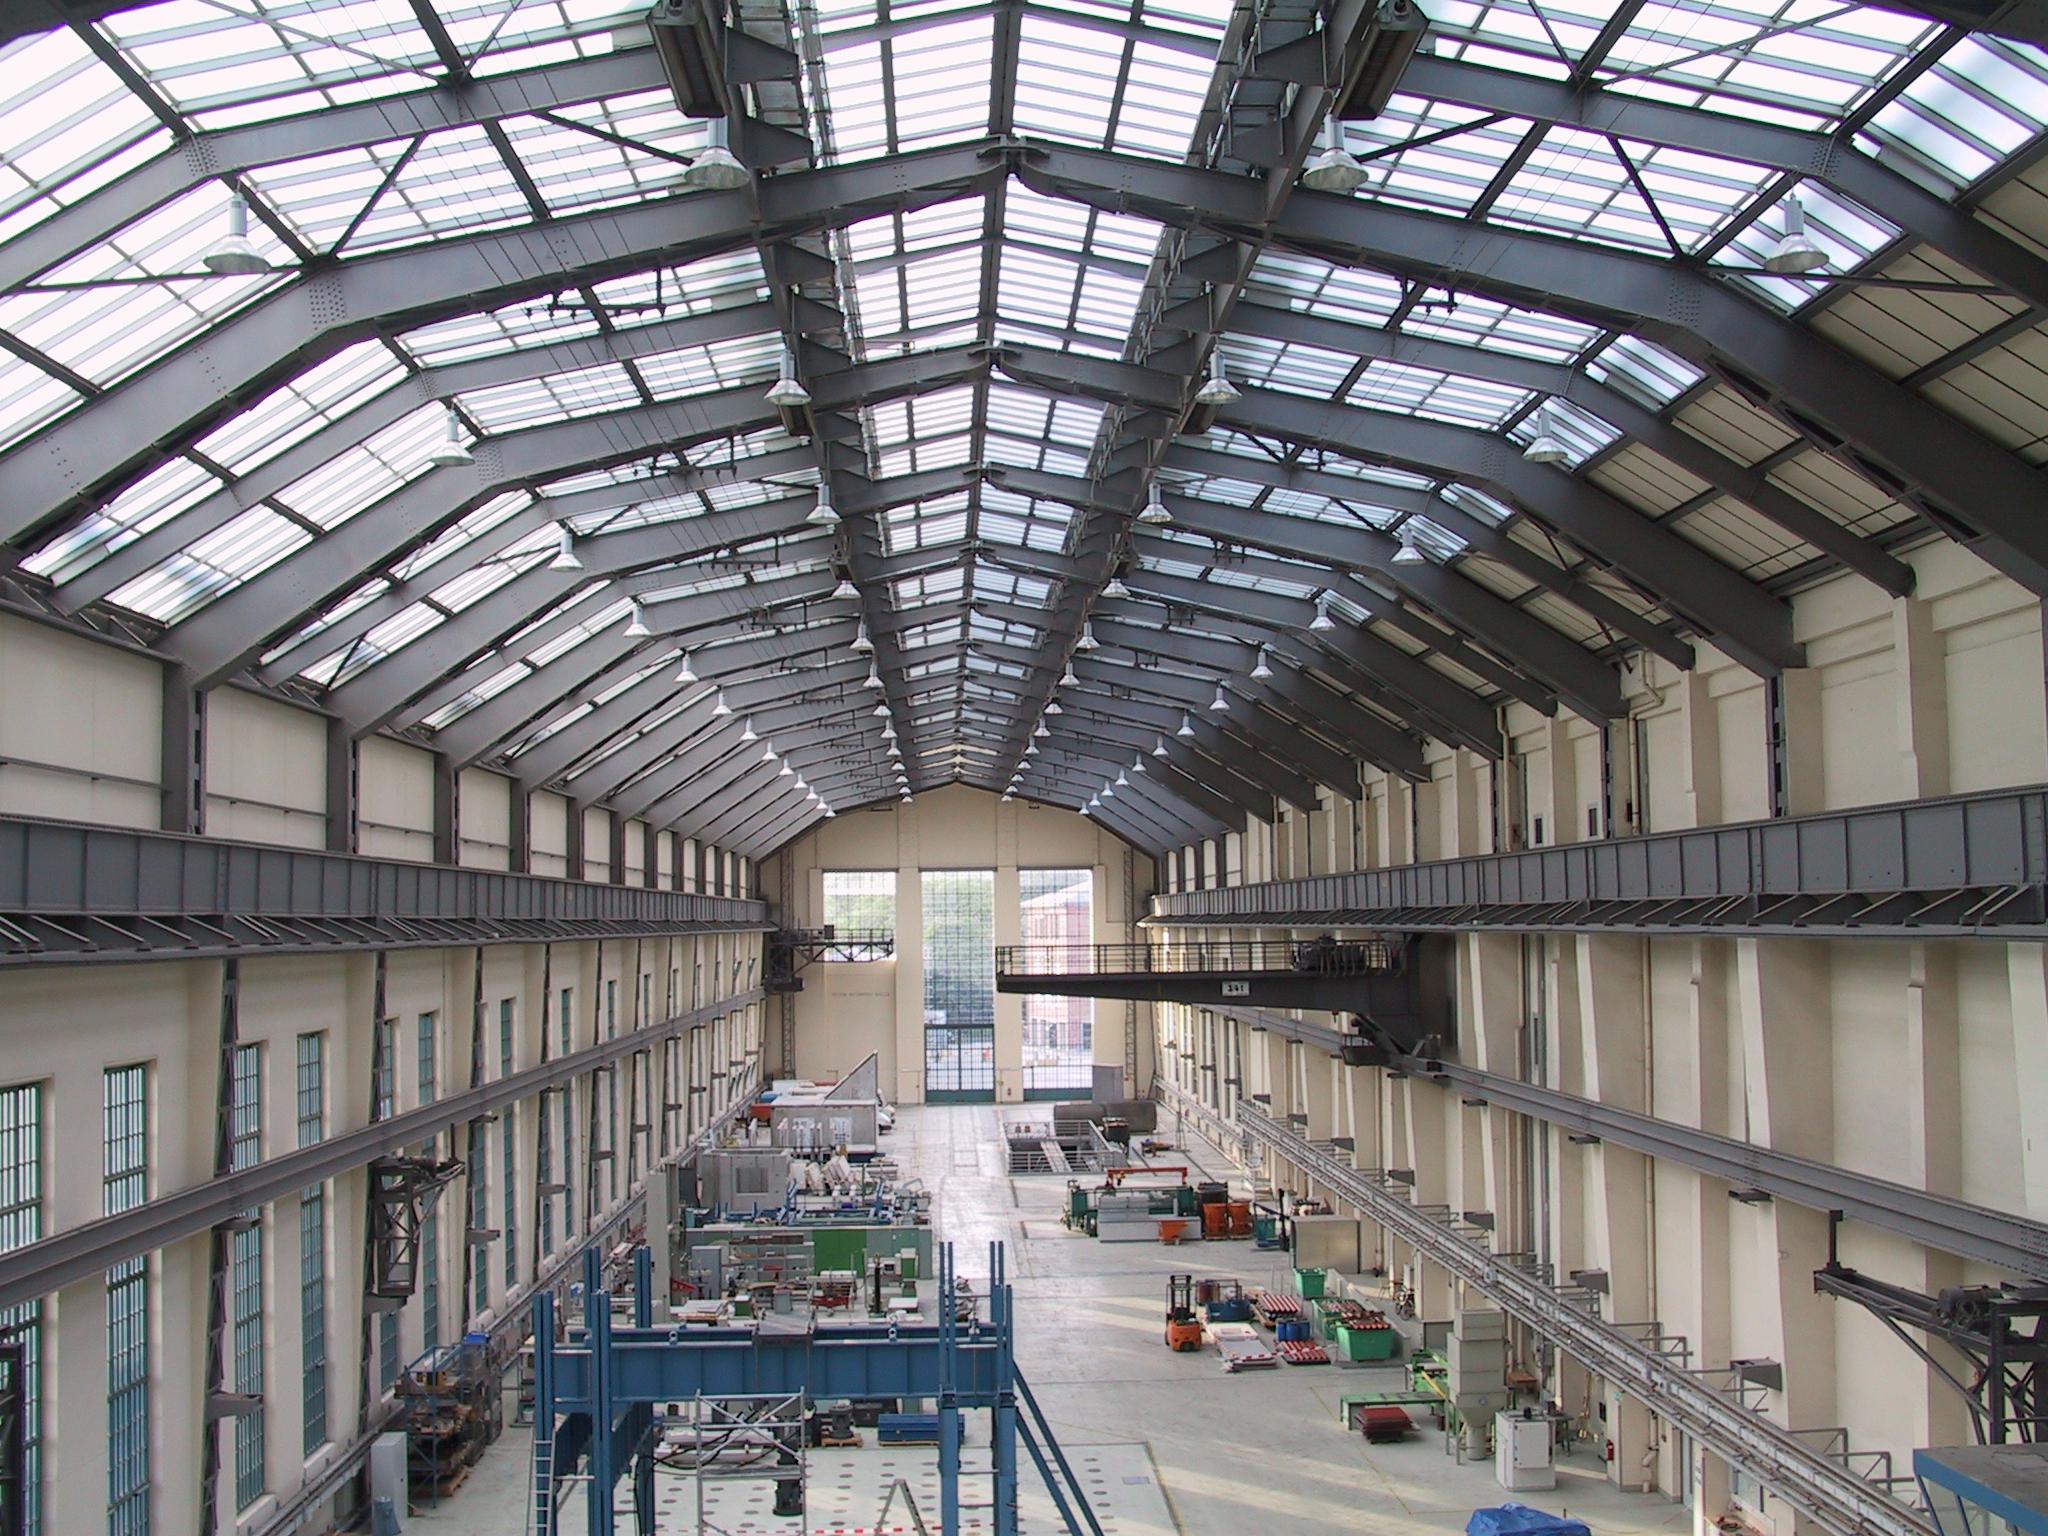 File peter behrens halle innen 2005 jpg wikimedia commons for Peter behrens aeg turbine factory